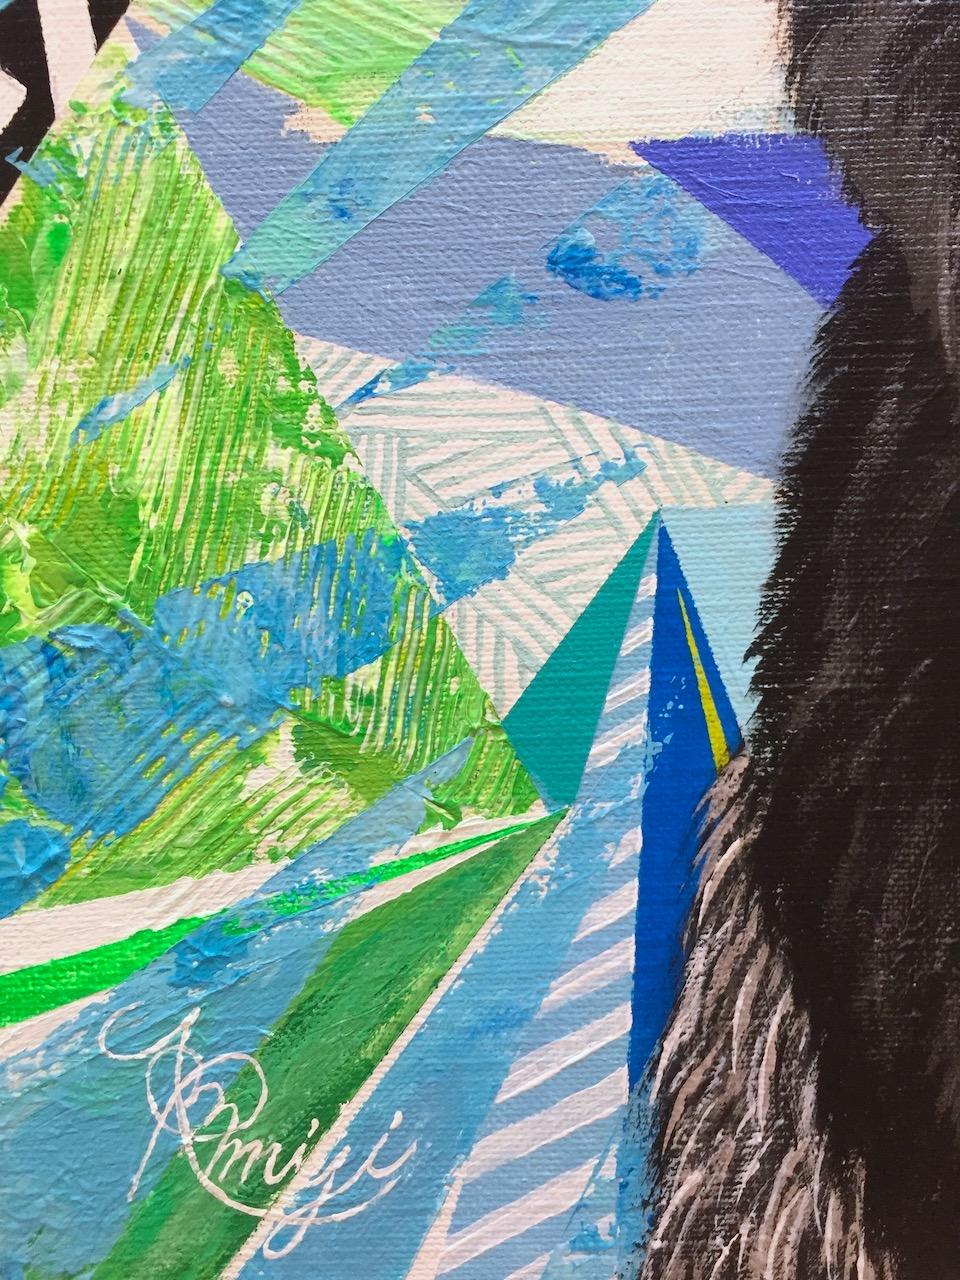 『 No title~commommarmoset~』 acrylic on canvas (41.0cm×41.0cm/S6)